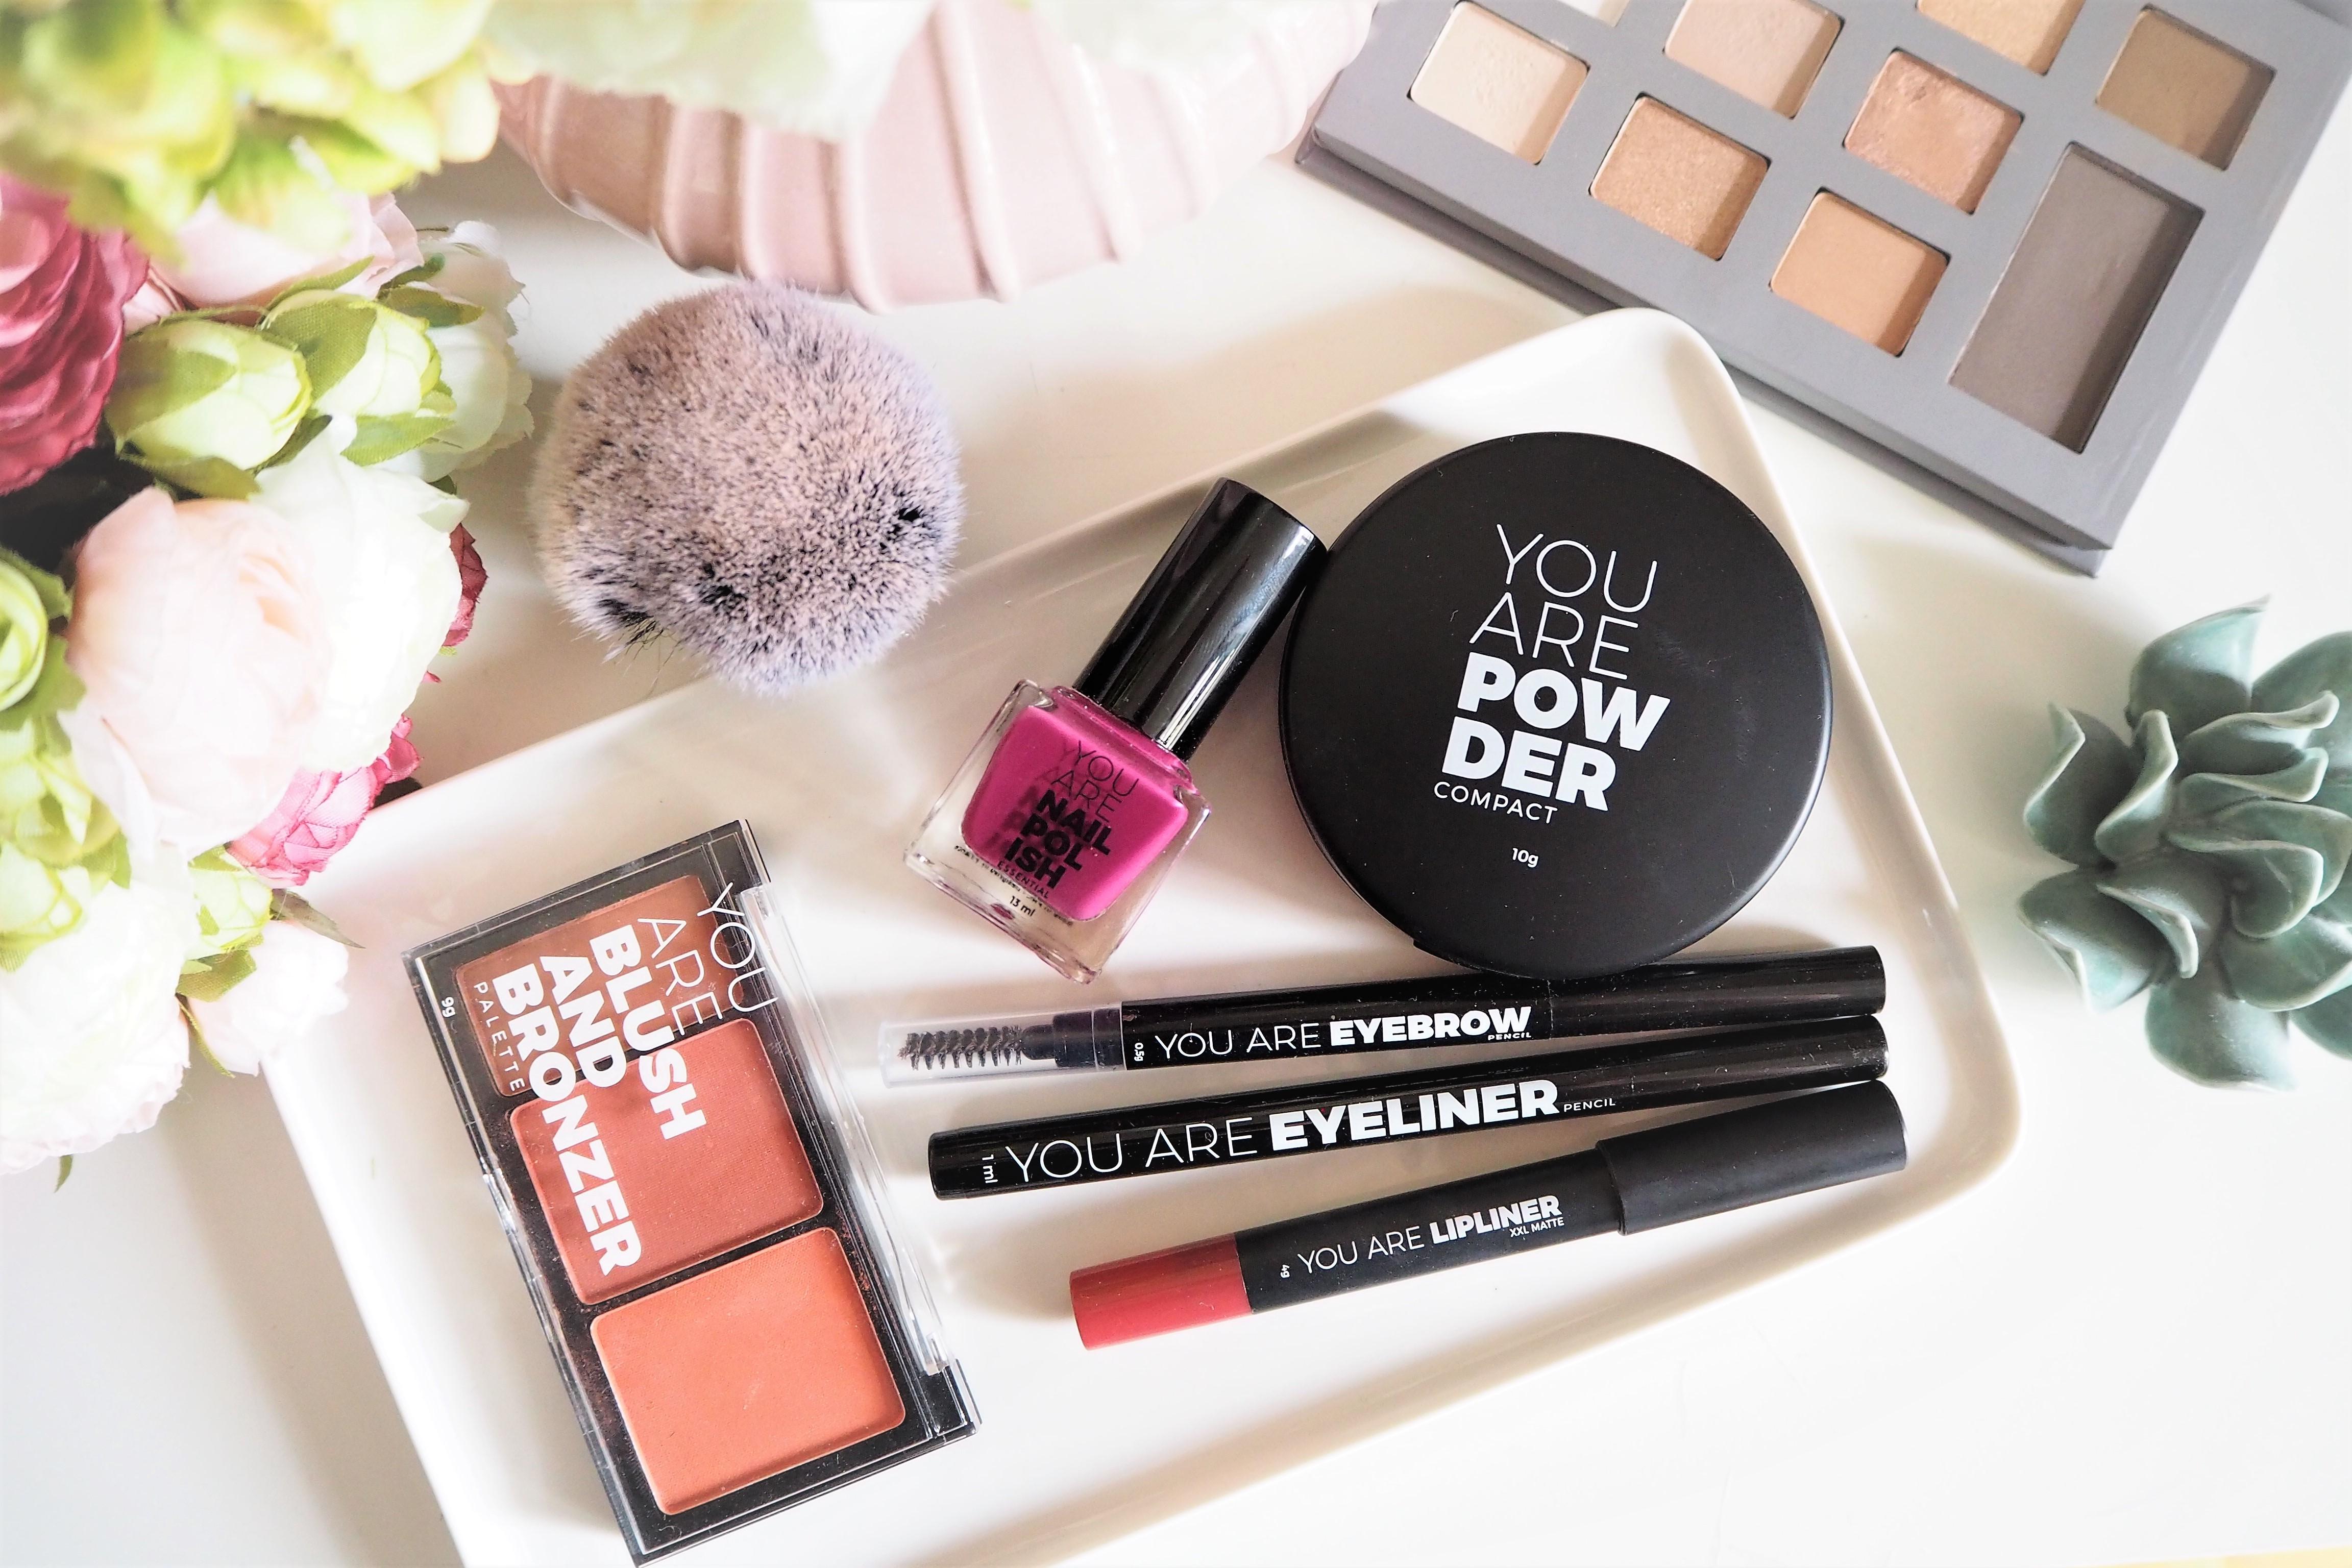 ur cosmetics maquillage pas cher et de qualite